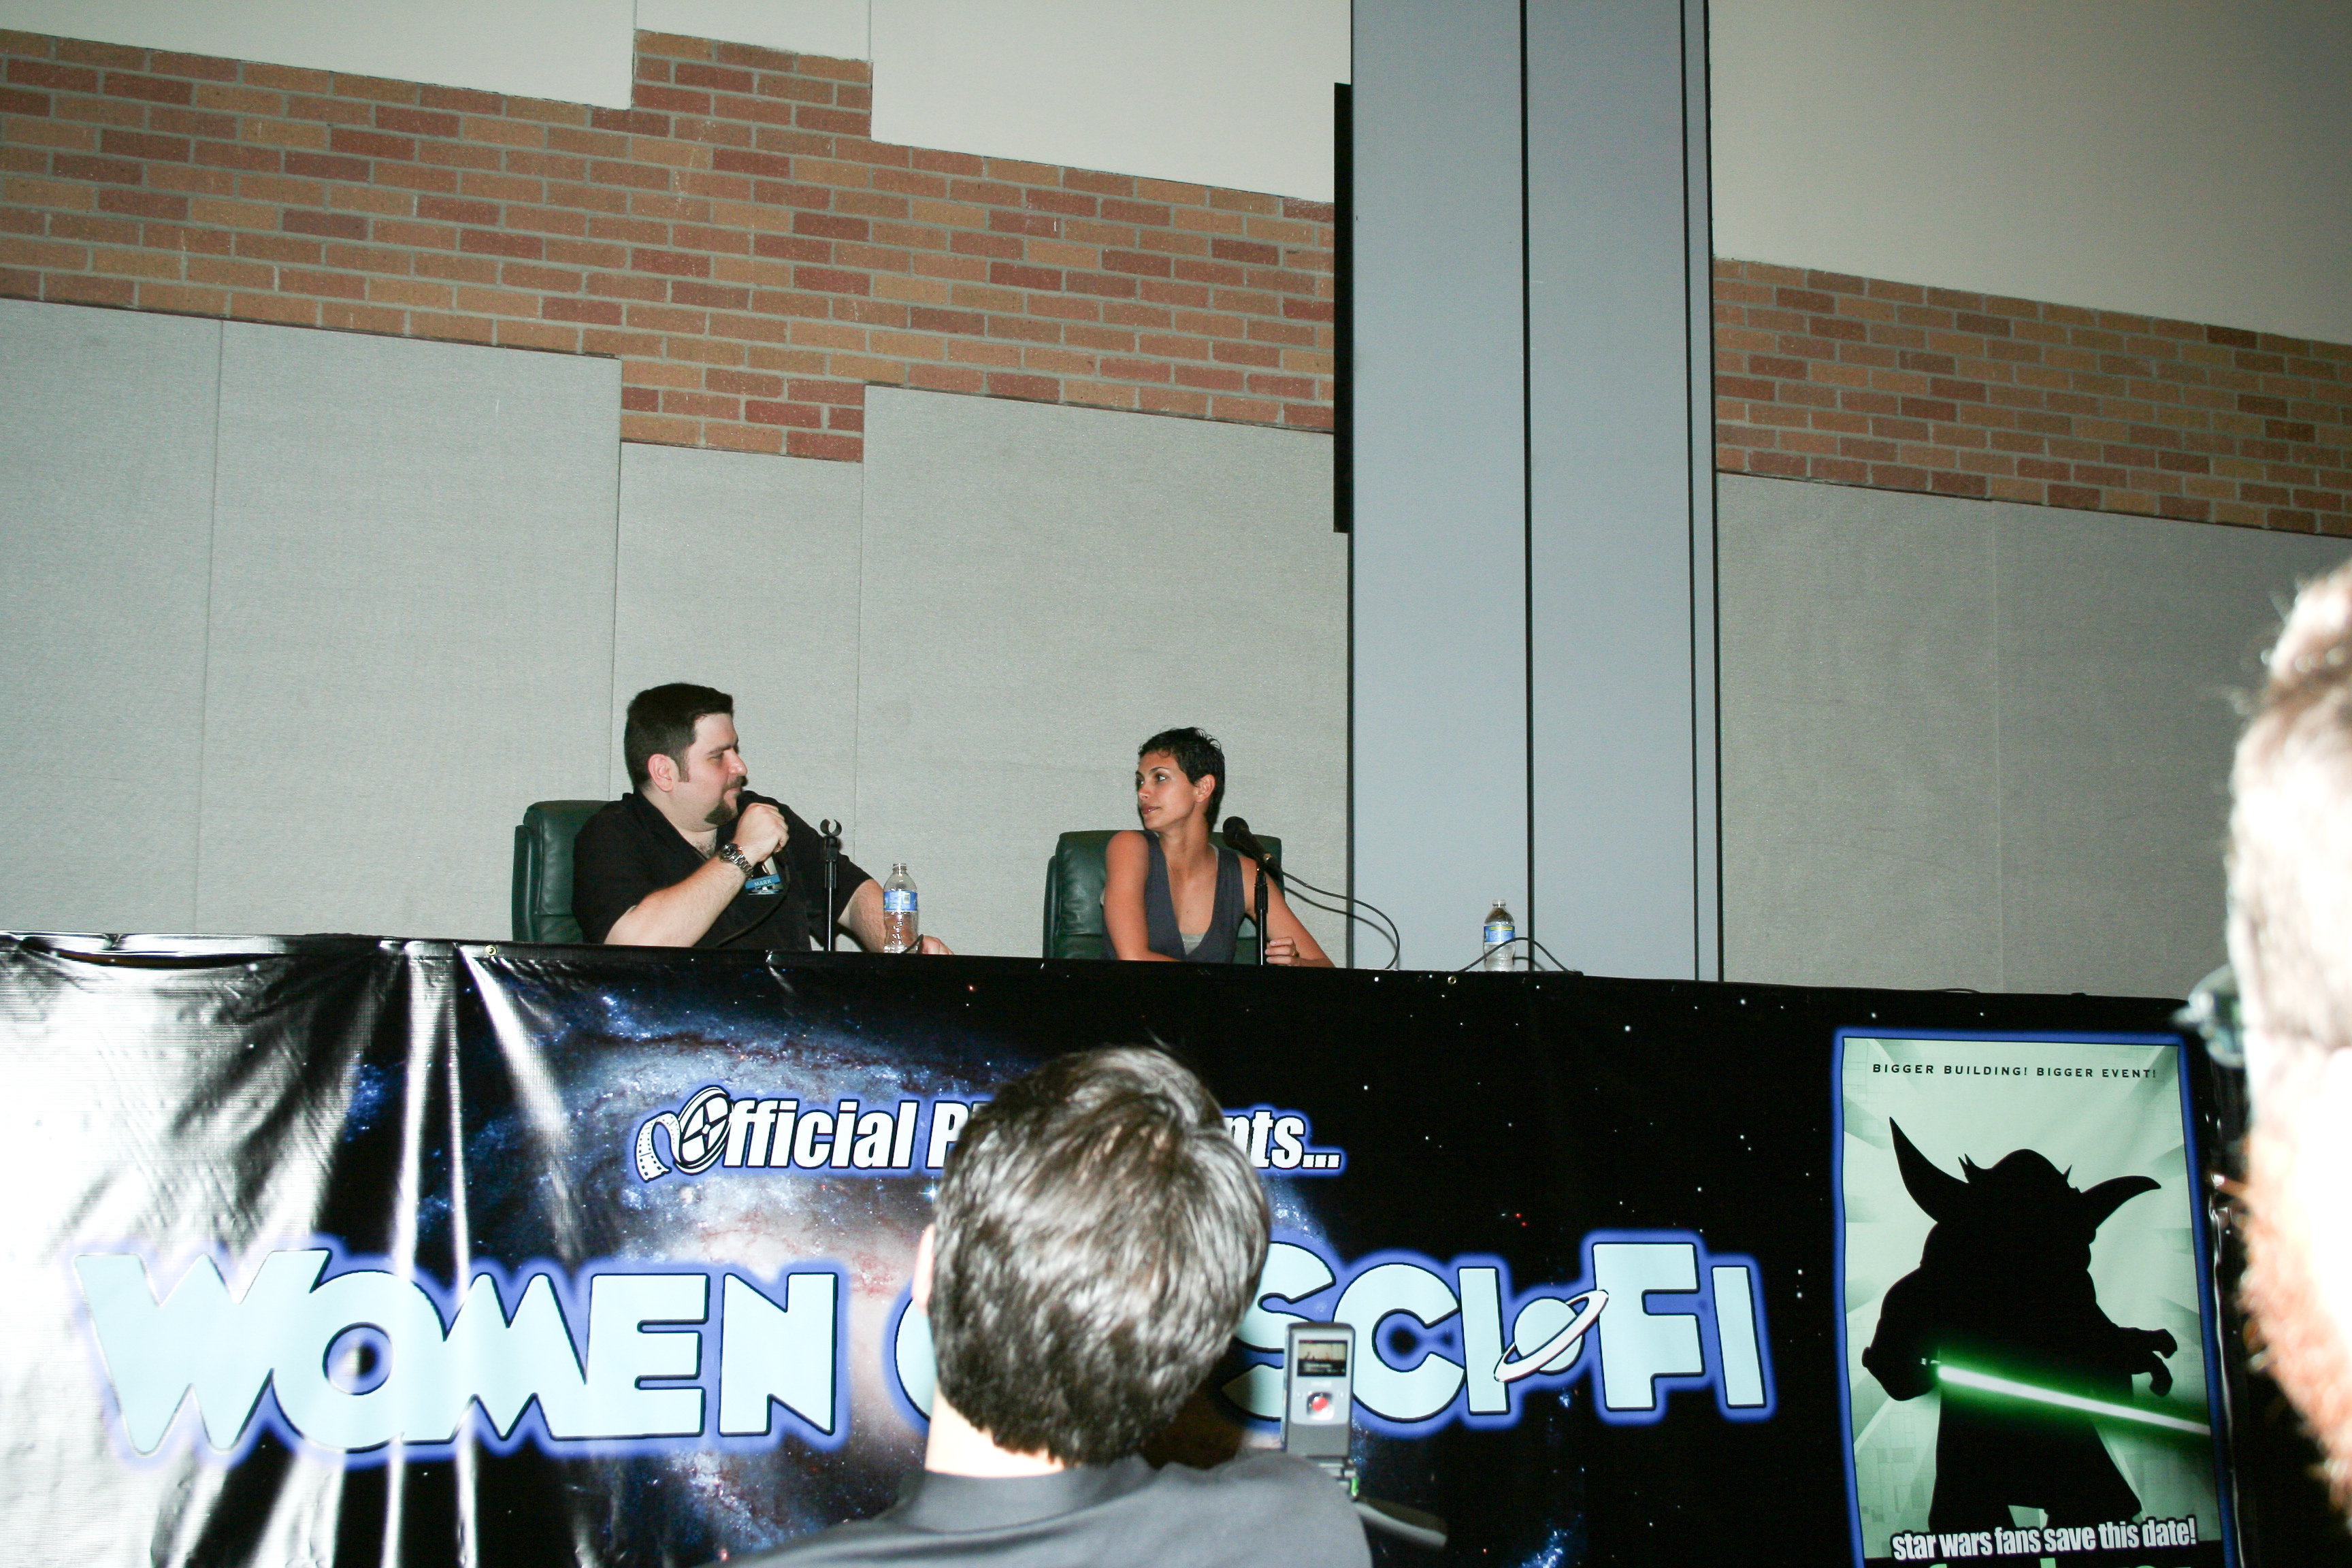 File:Morena Baccarin @ 2011 Sci-Fi Expo 03 jpg - Wikimedia Commons